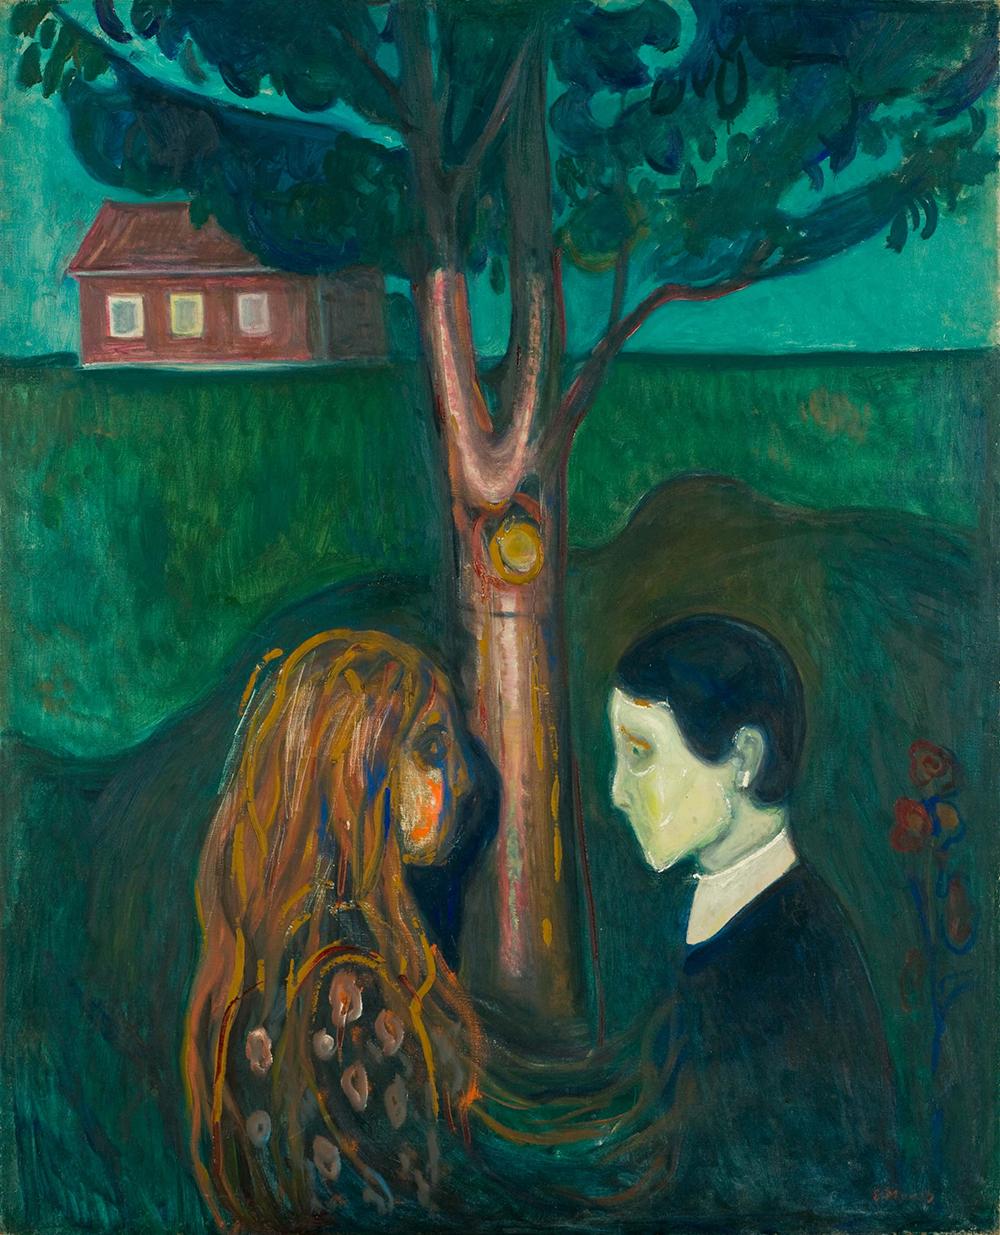 Edvard Munch. Eye to eye